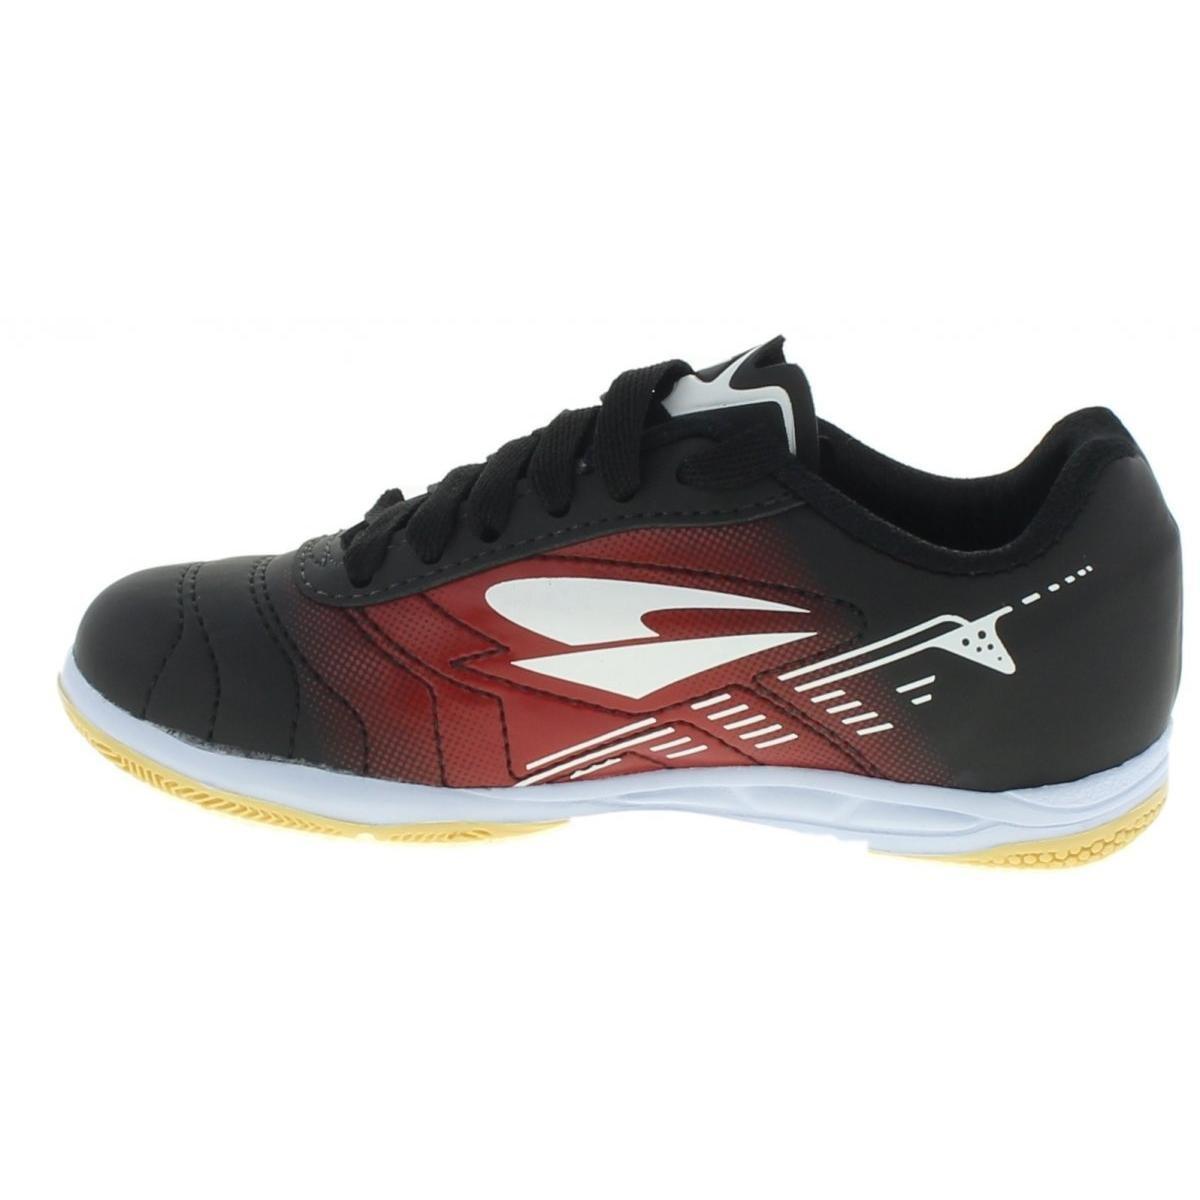 Chuteira Infantil Futsal Dray Masculina - Compre Agora  dff59fdcbd6ea